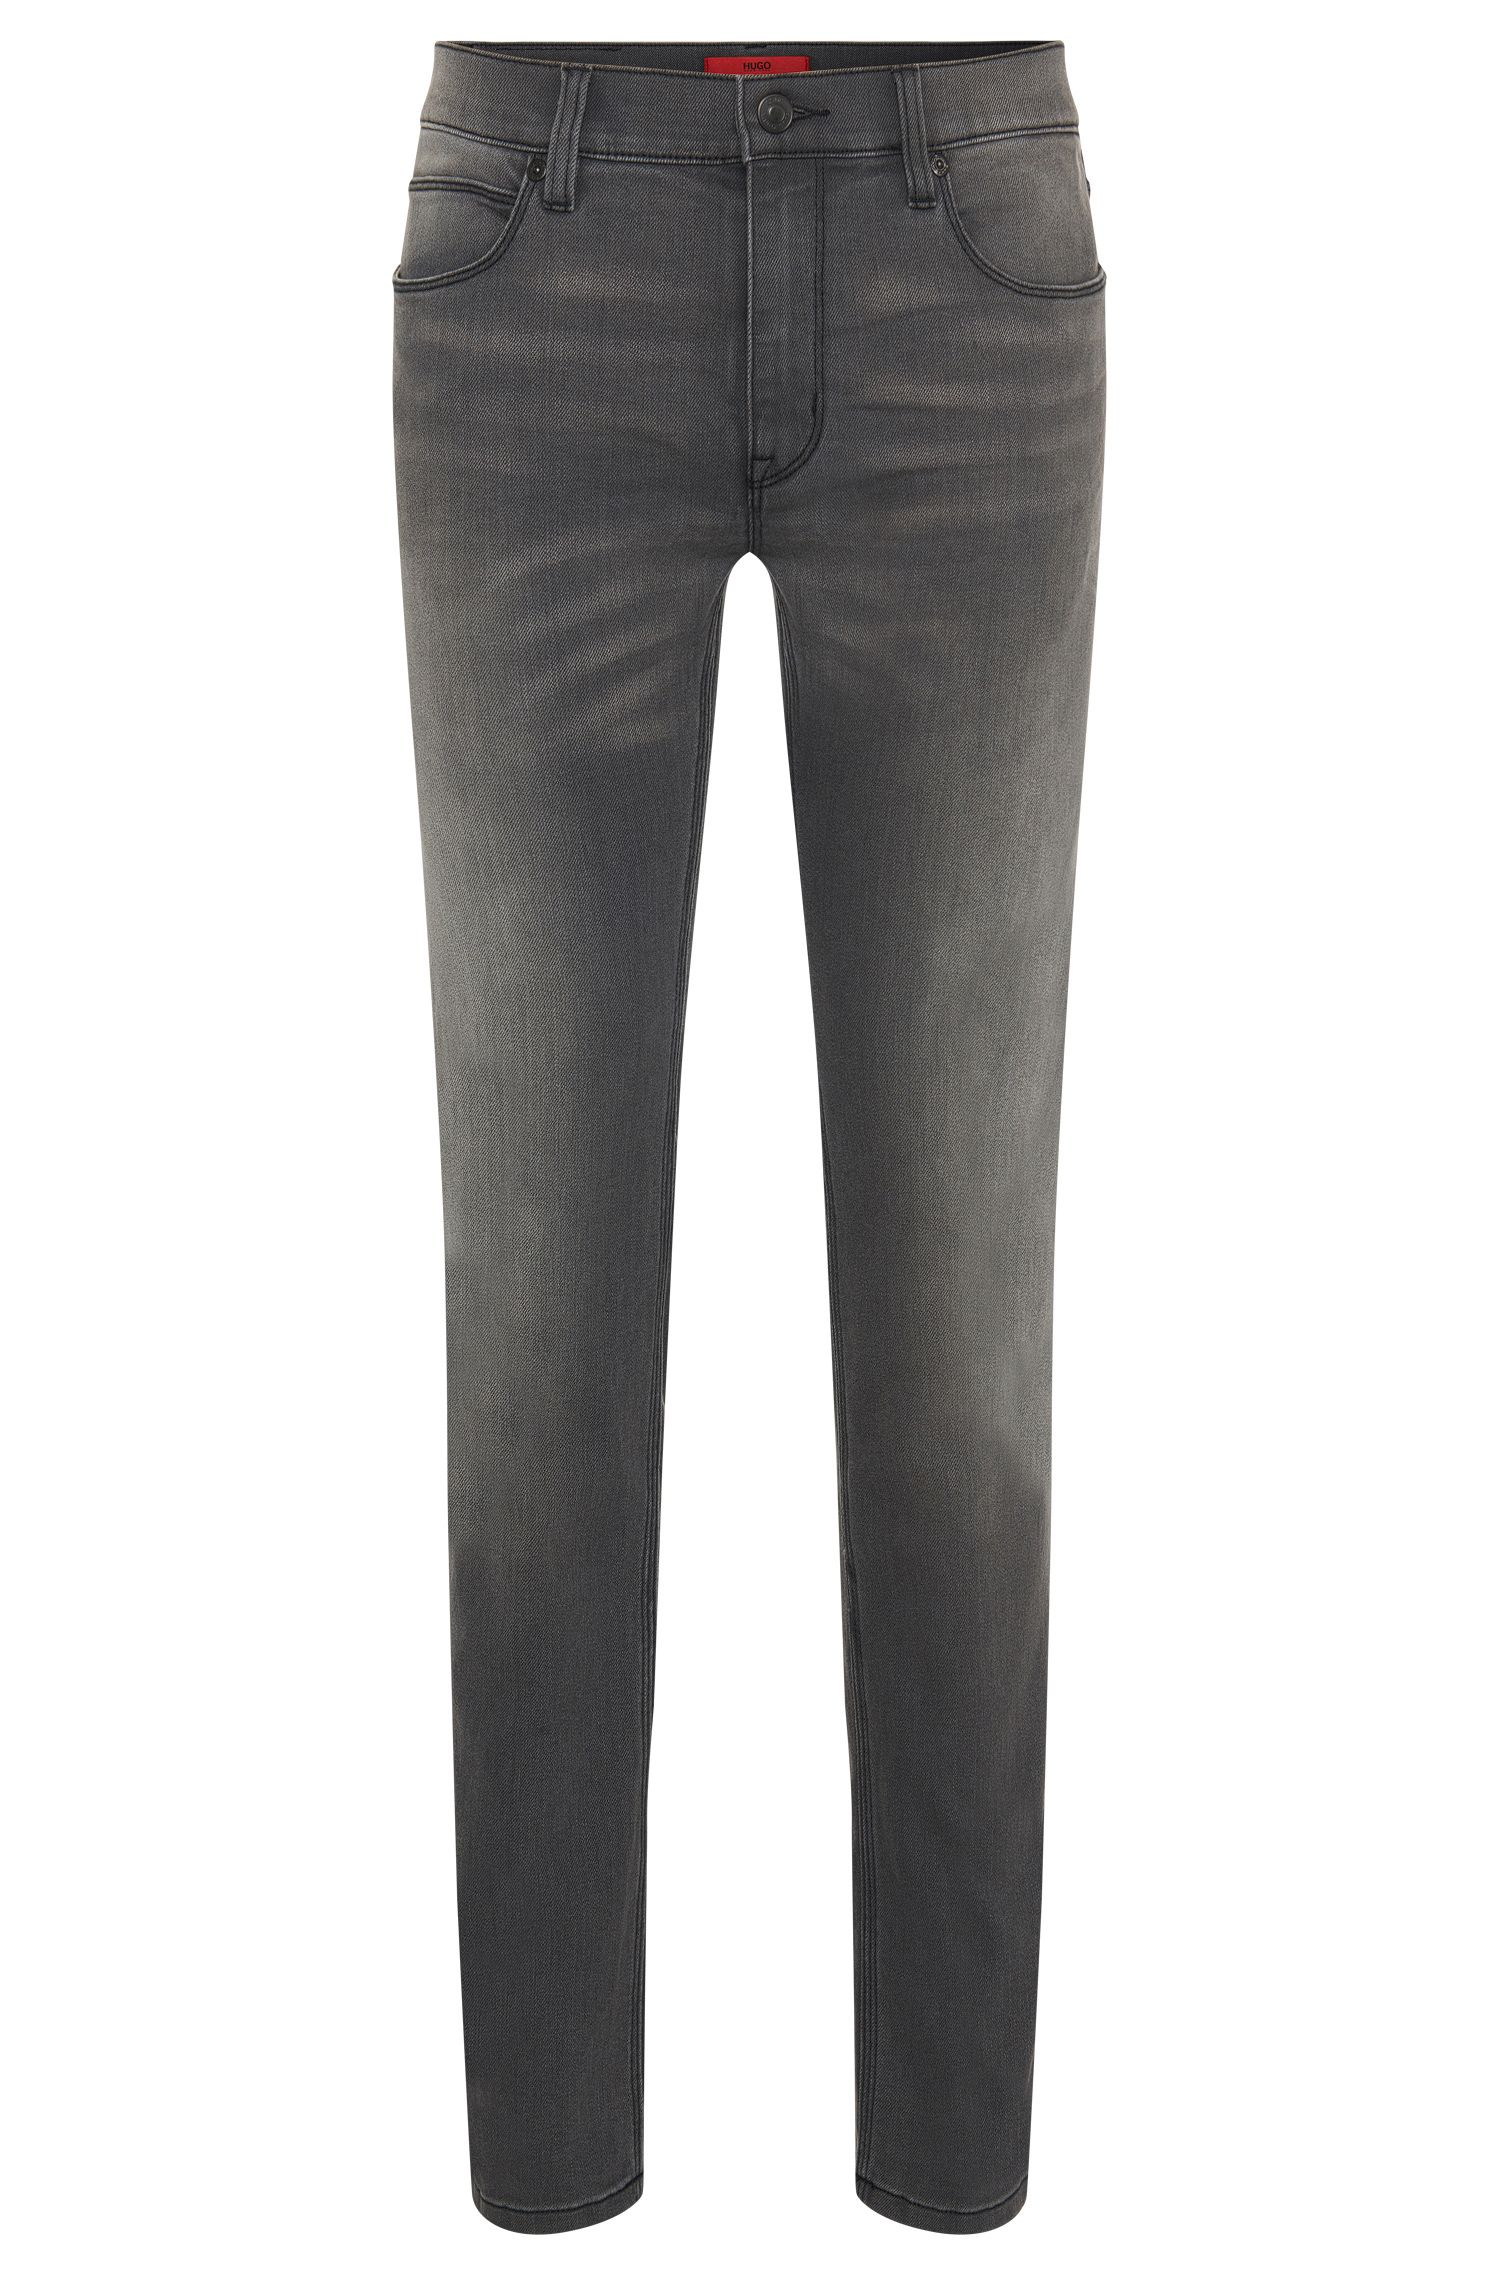 'HUGO 708' | Slim Fit, 11.25 oz Stretch Cotton Blend Jeans